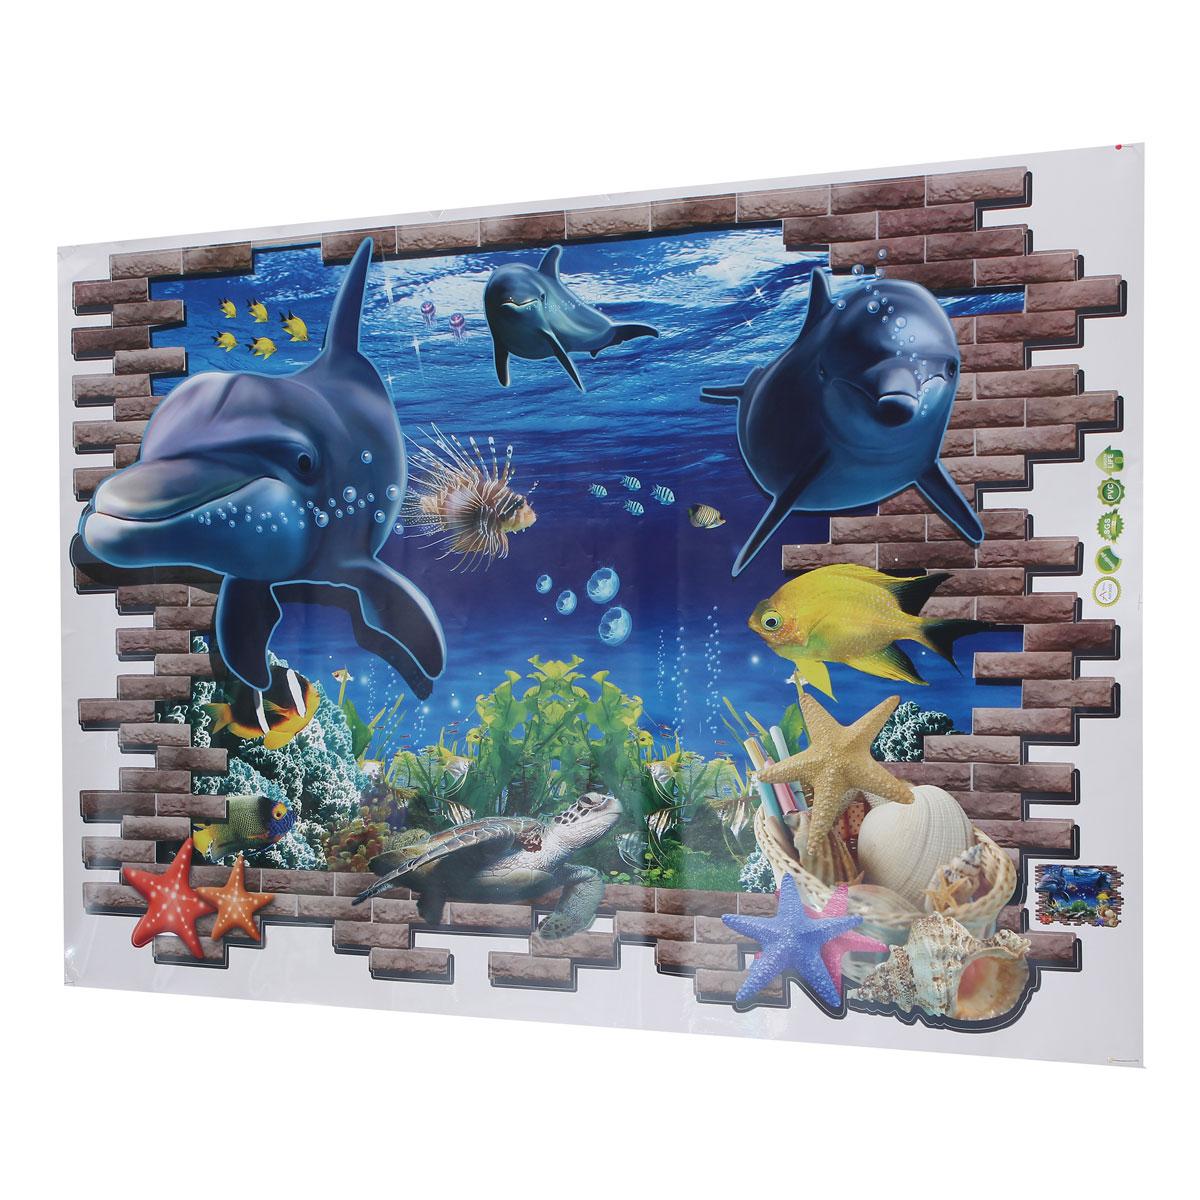 3d blue sea world dolphin removable wall sticker wallpaper 3d dolphin picture wall decor photo home decor picture ebay